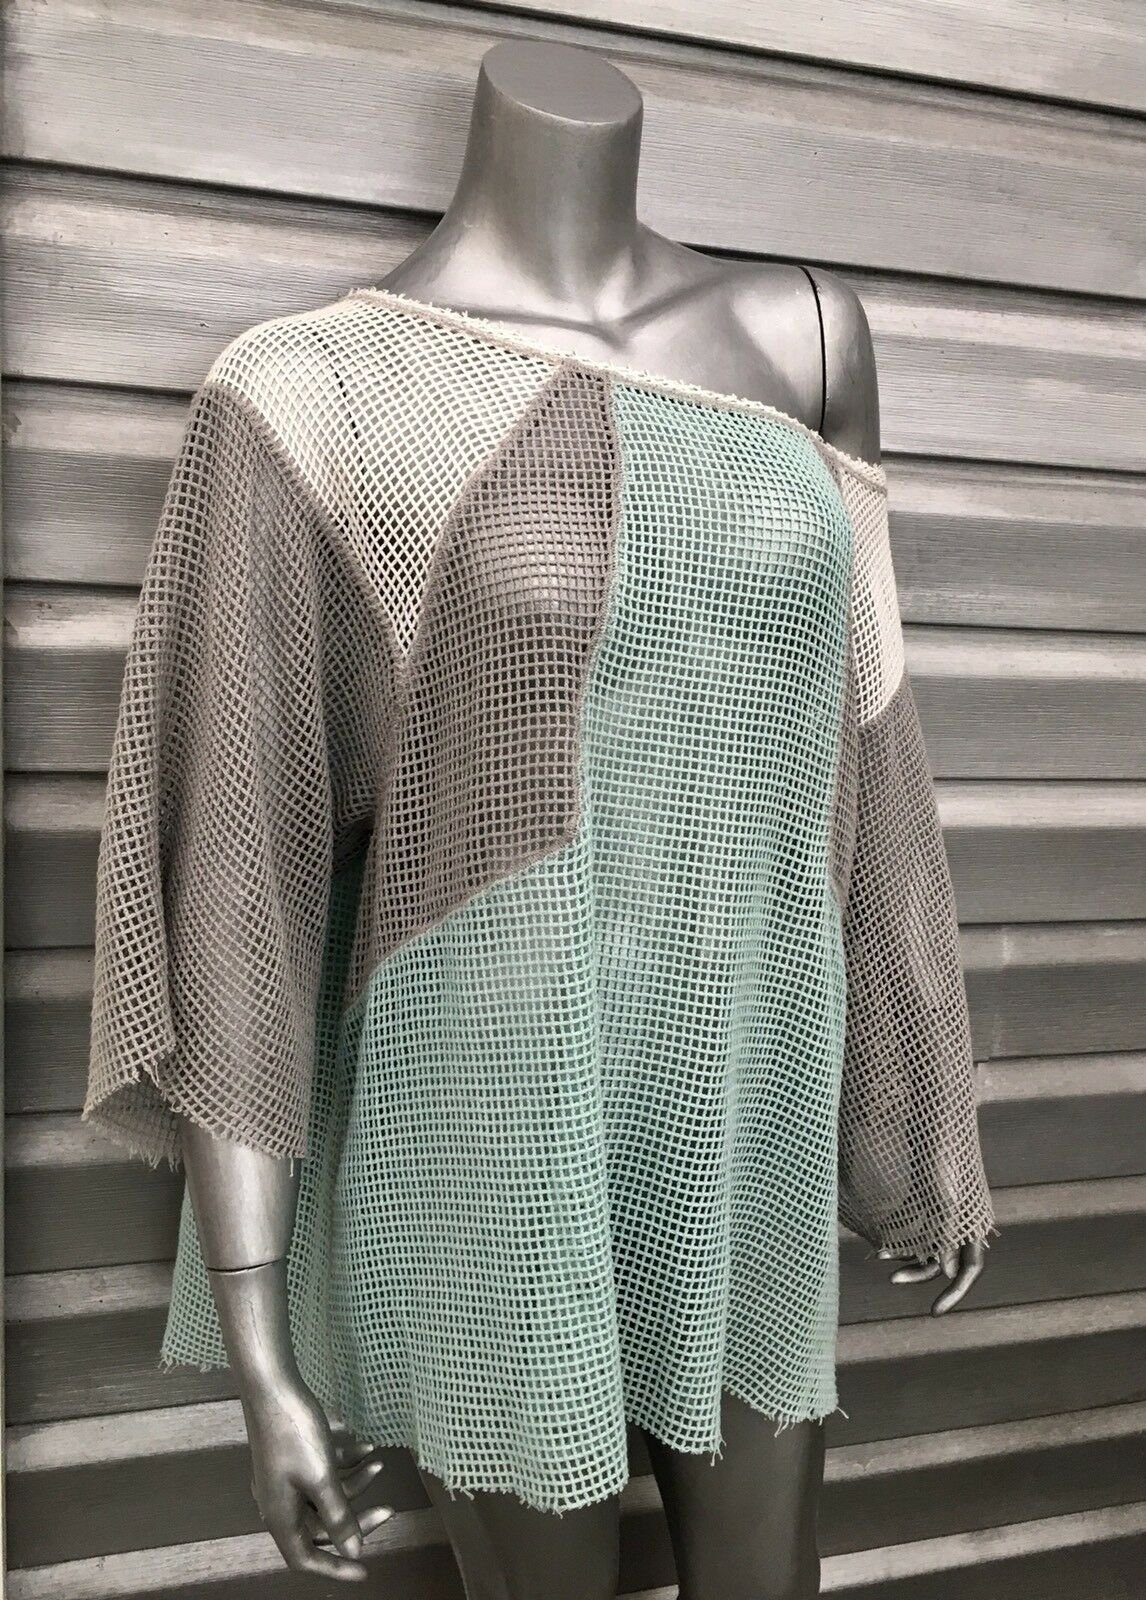 FREE PEOPLE Oversized Net Crochet Boho Tunic Top